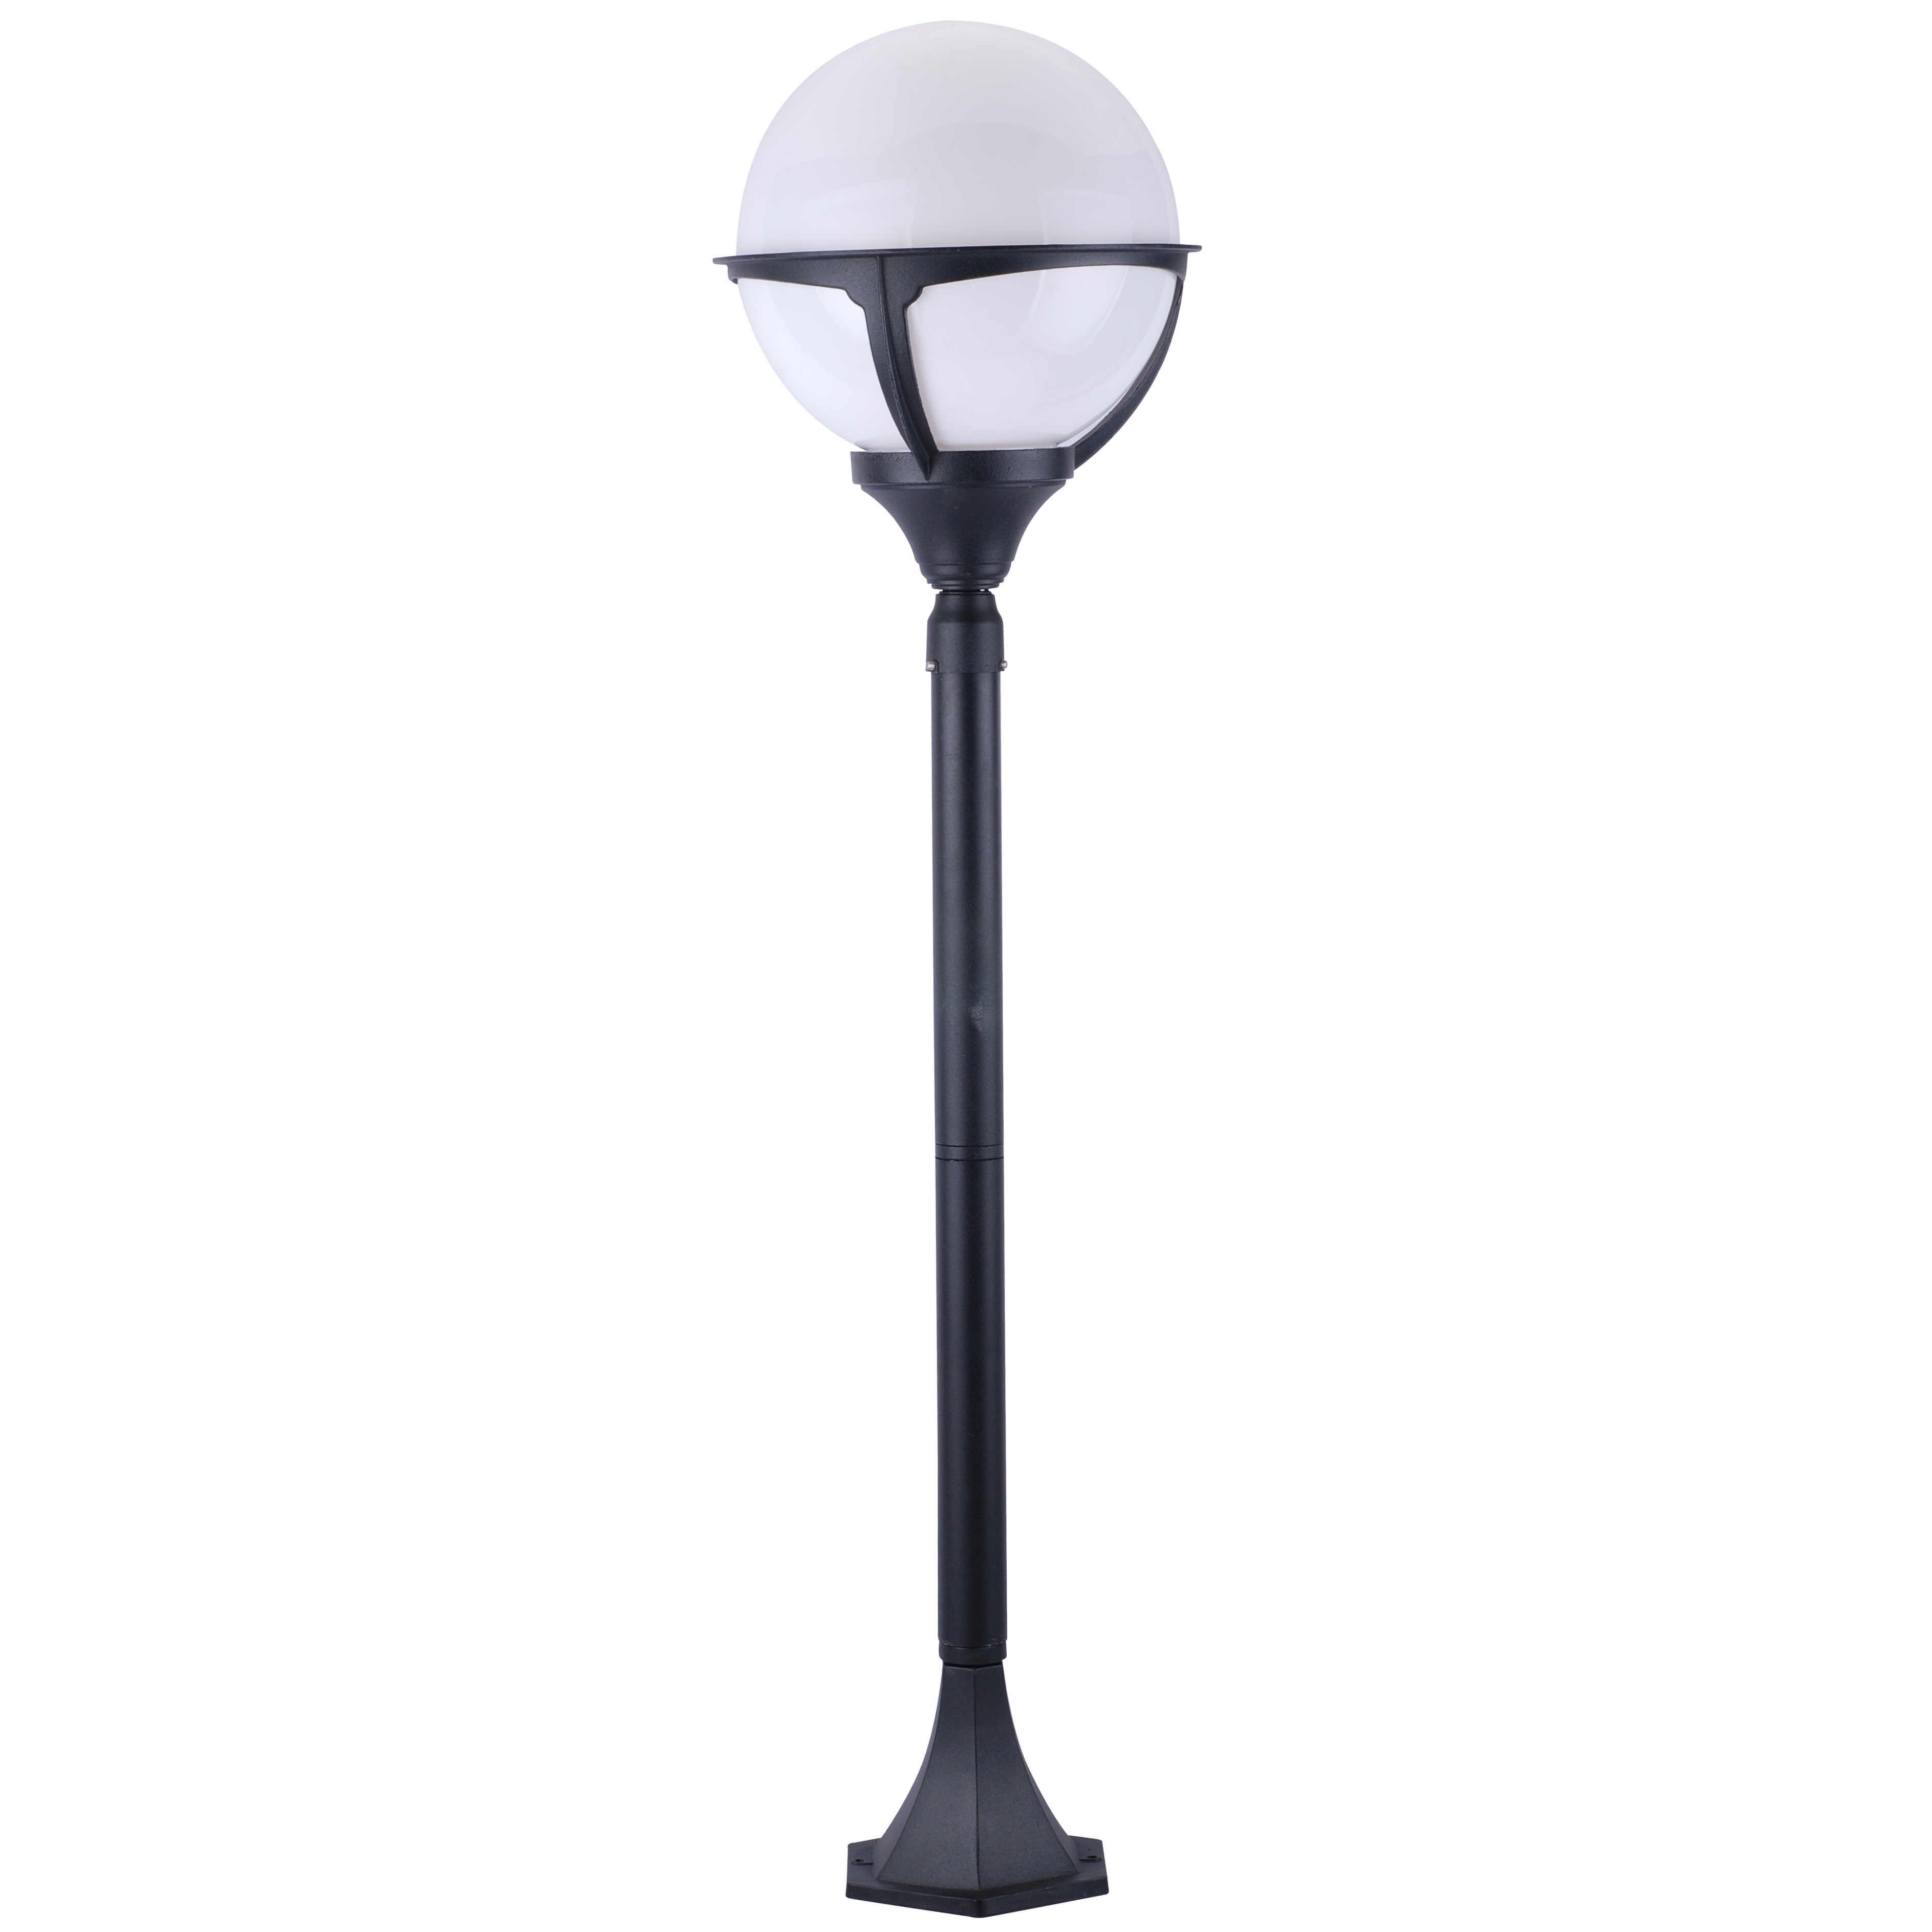 Светильник уличный Arte lamp Monaco a1496pa-1bk